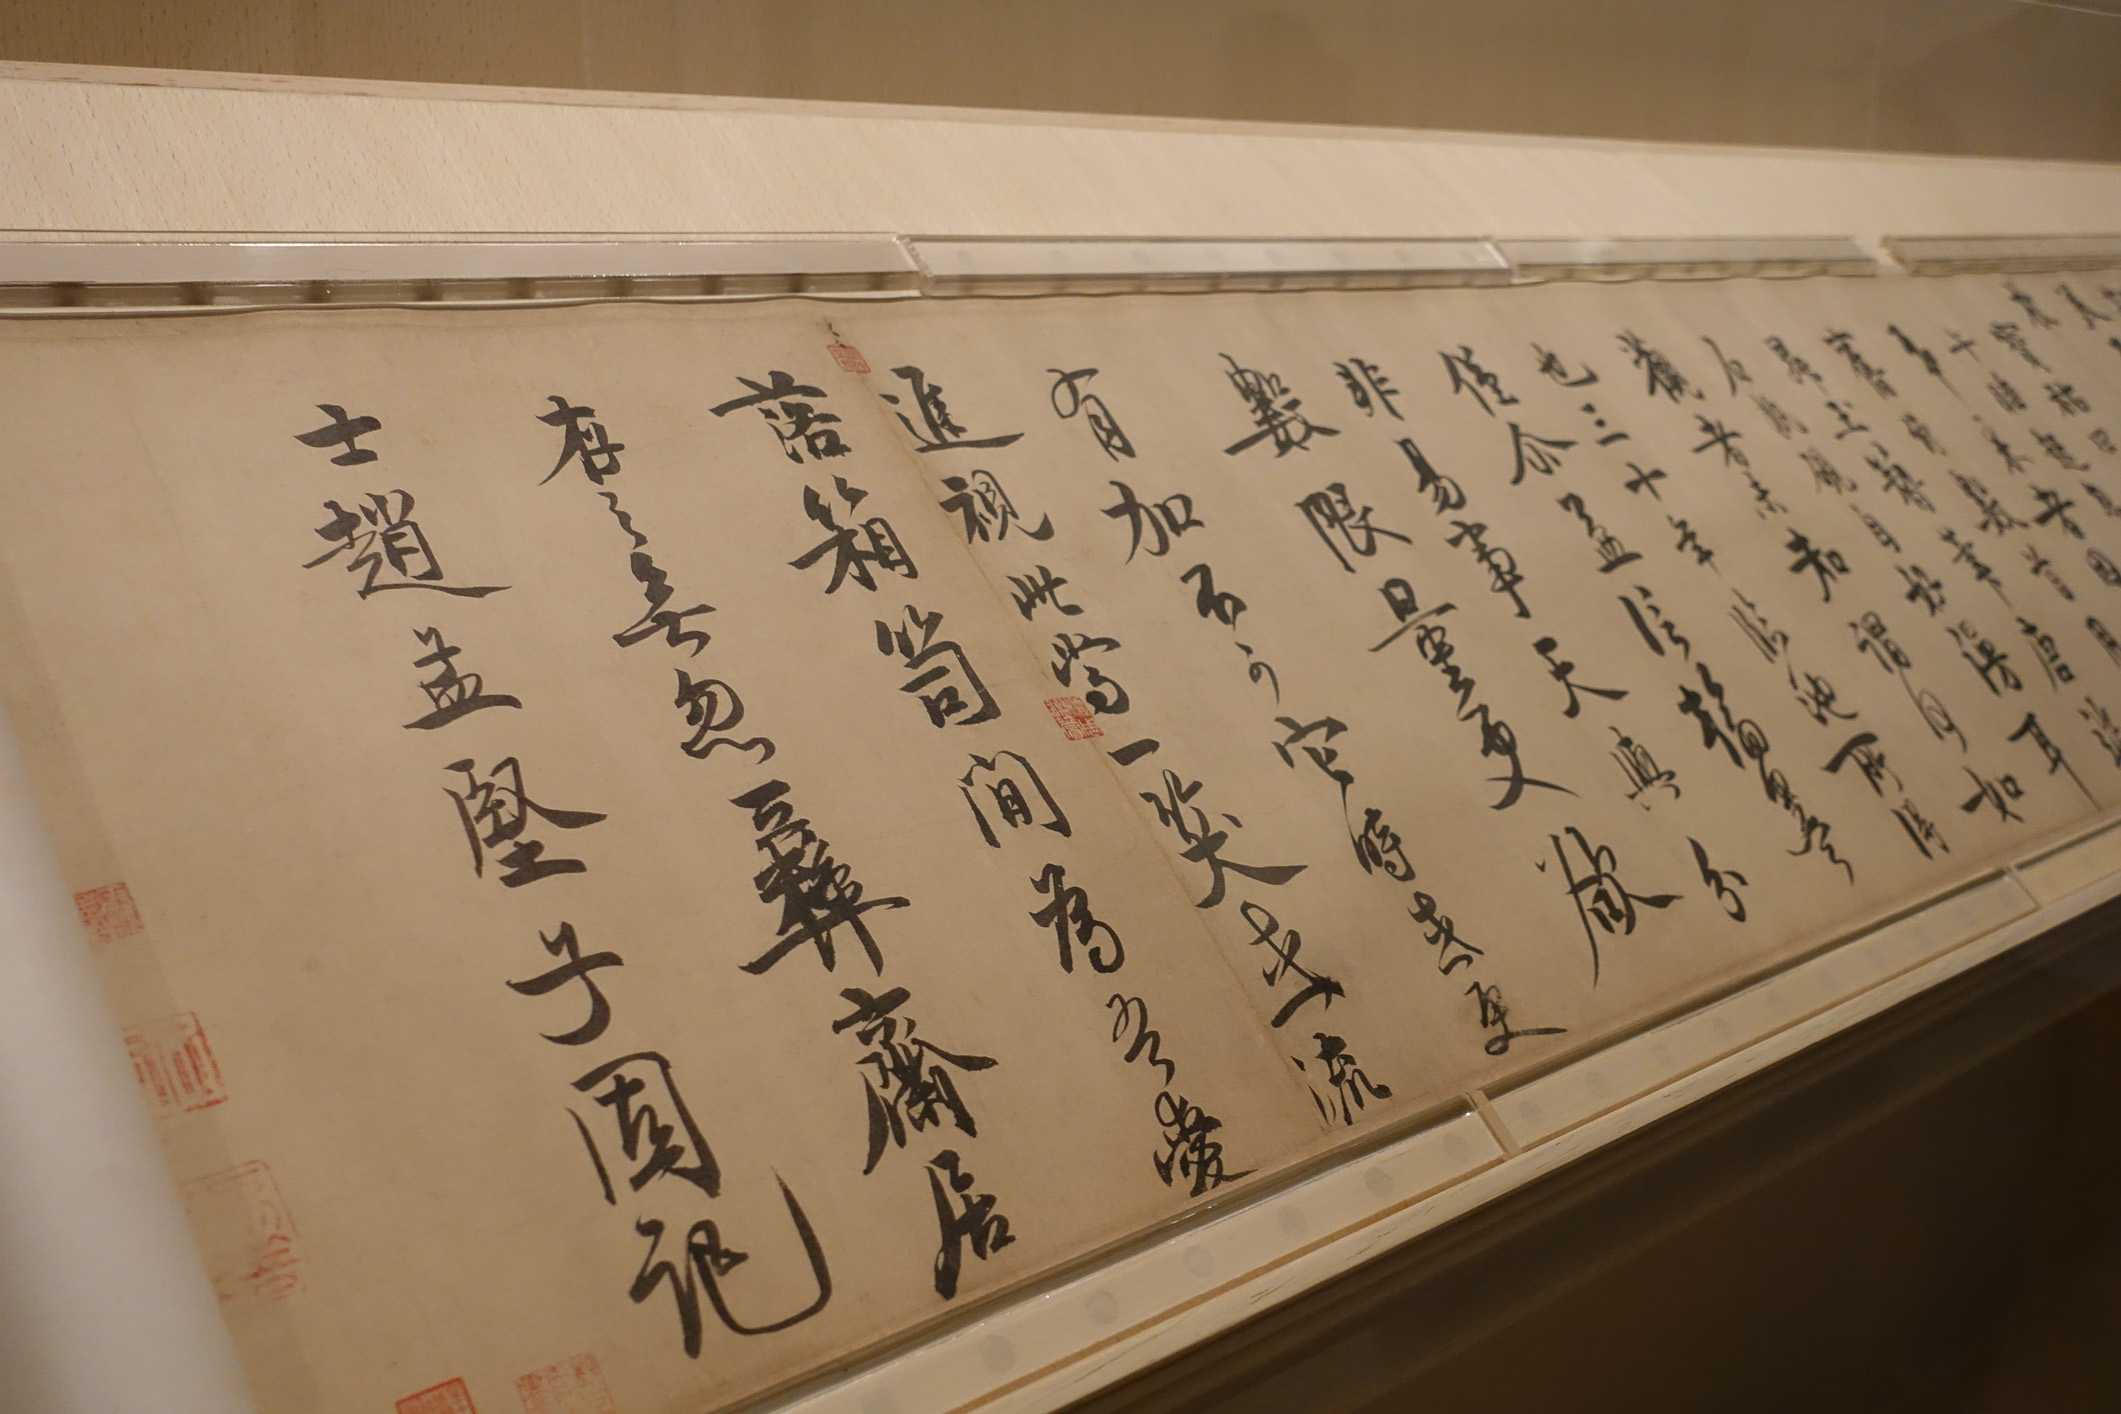 Official script in Shanghai Musuem